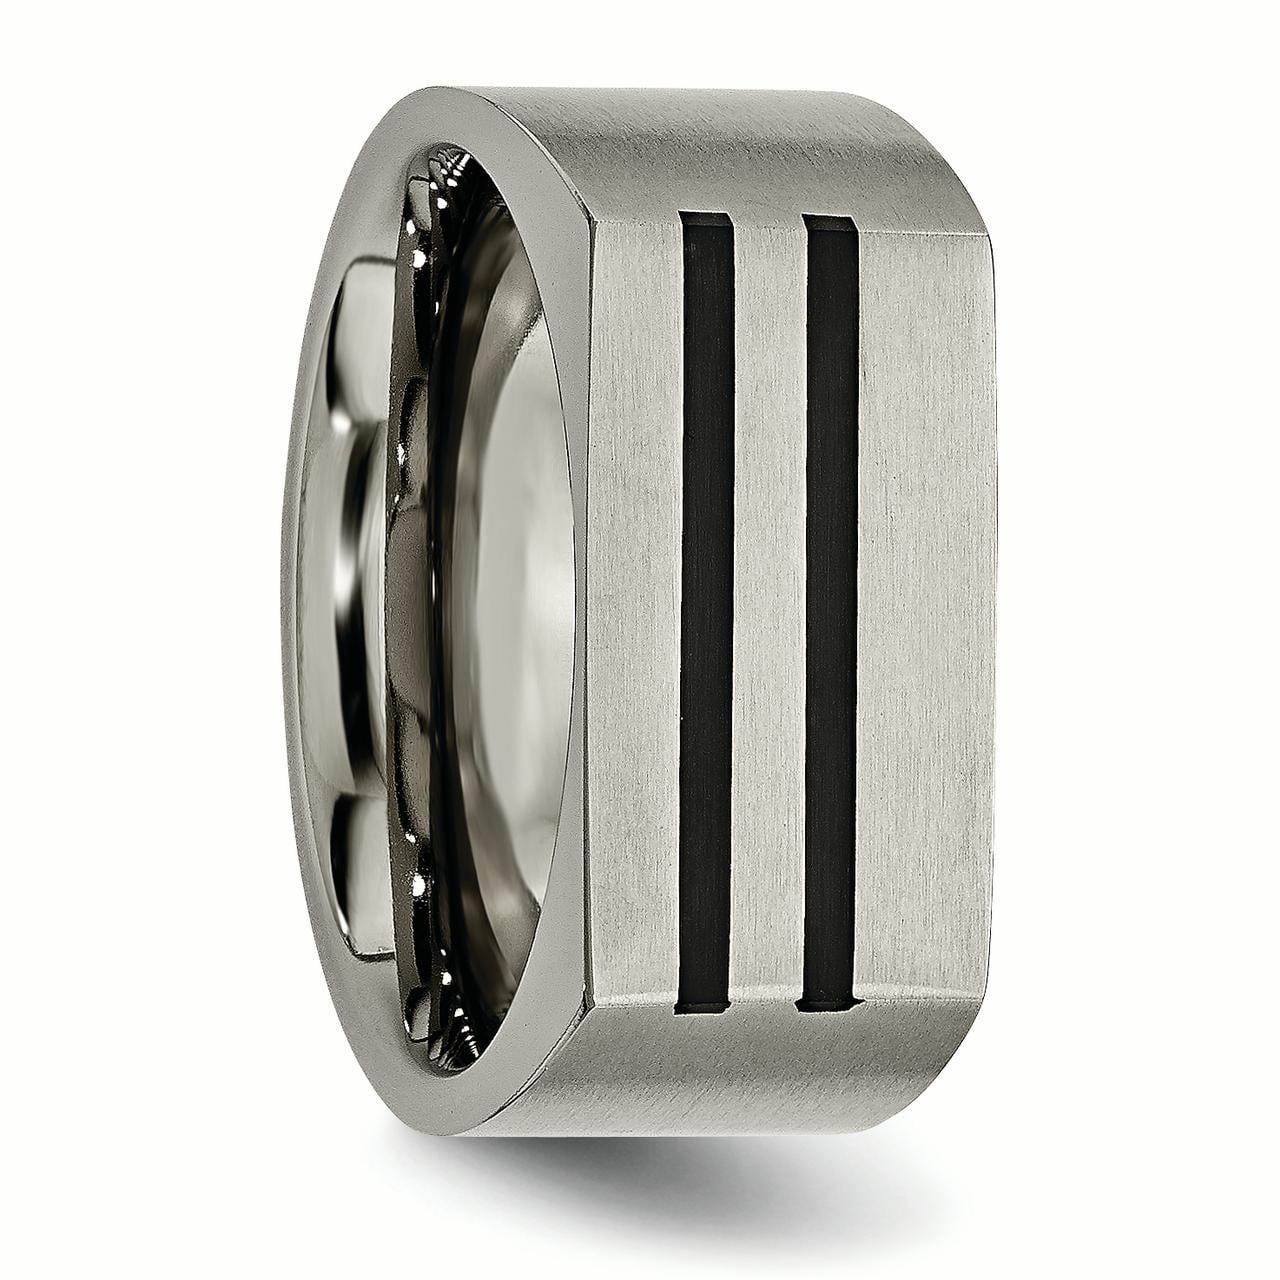 Perfect Jewelry Gift Titanium 10mm Black Enamel Stripes Brushed Band